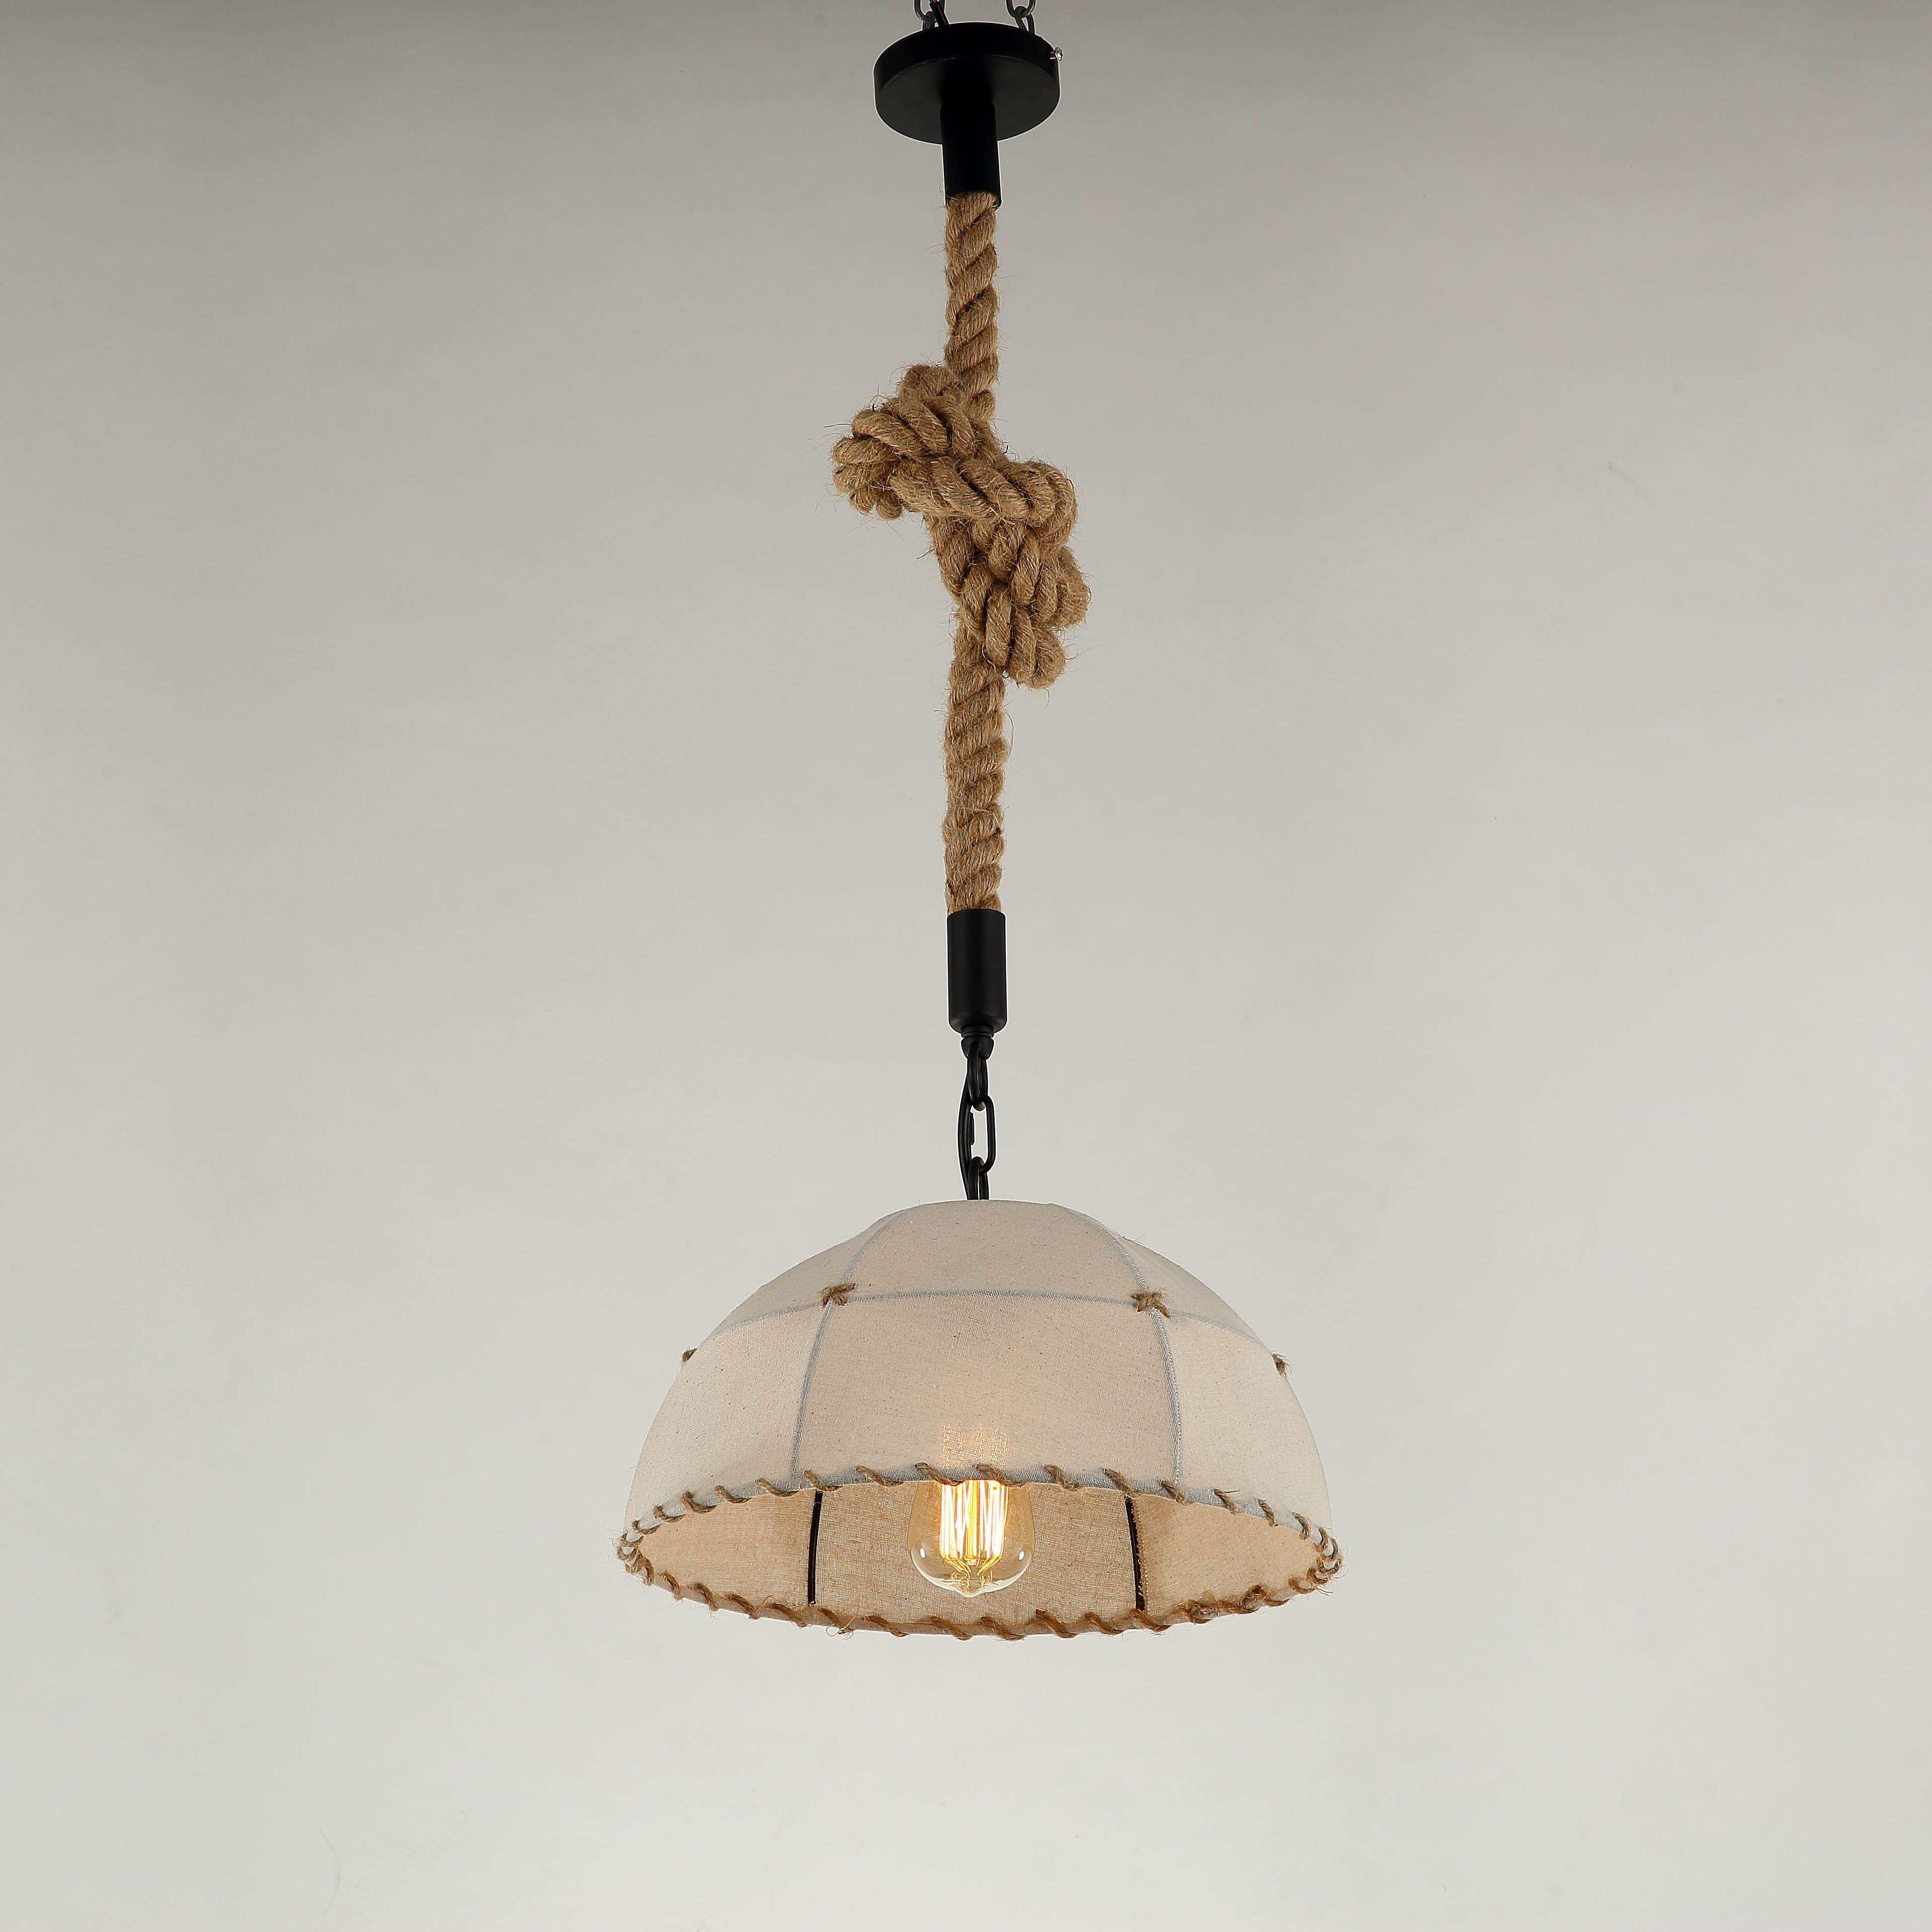 vintage kitchen lighting fixtures. Vintage Hand Knitting Lamp Pendant Lights Fixture Hemp Rope Lampshade E27 Holder For Kitchen Light Lampe Lighting Fixtures L